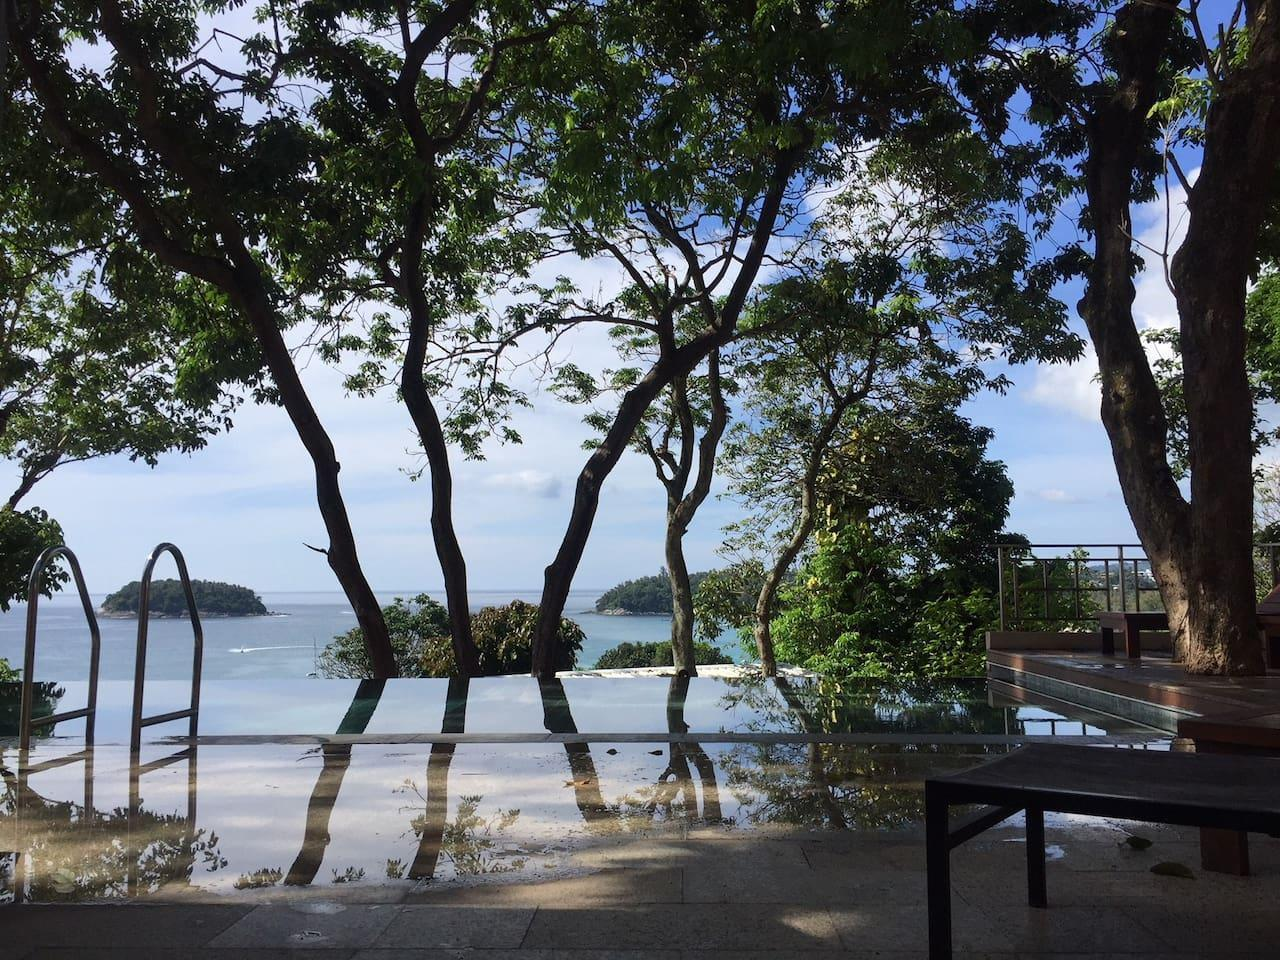 1 bed bungalow very near Kata beach with sea views บ้านเดี่ยว 1 ห้องนอน 1 ห้องน้ำส่วนตัว ขนาด 35 ตร.ม. – กะตะ